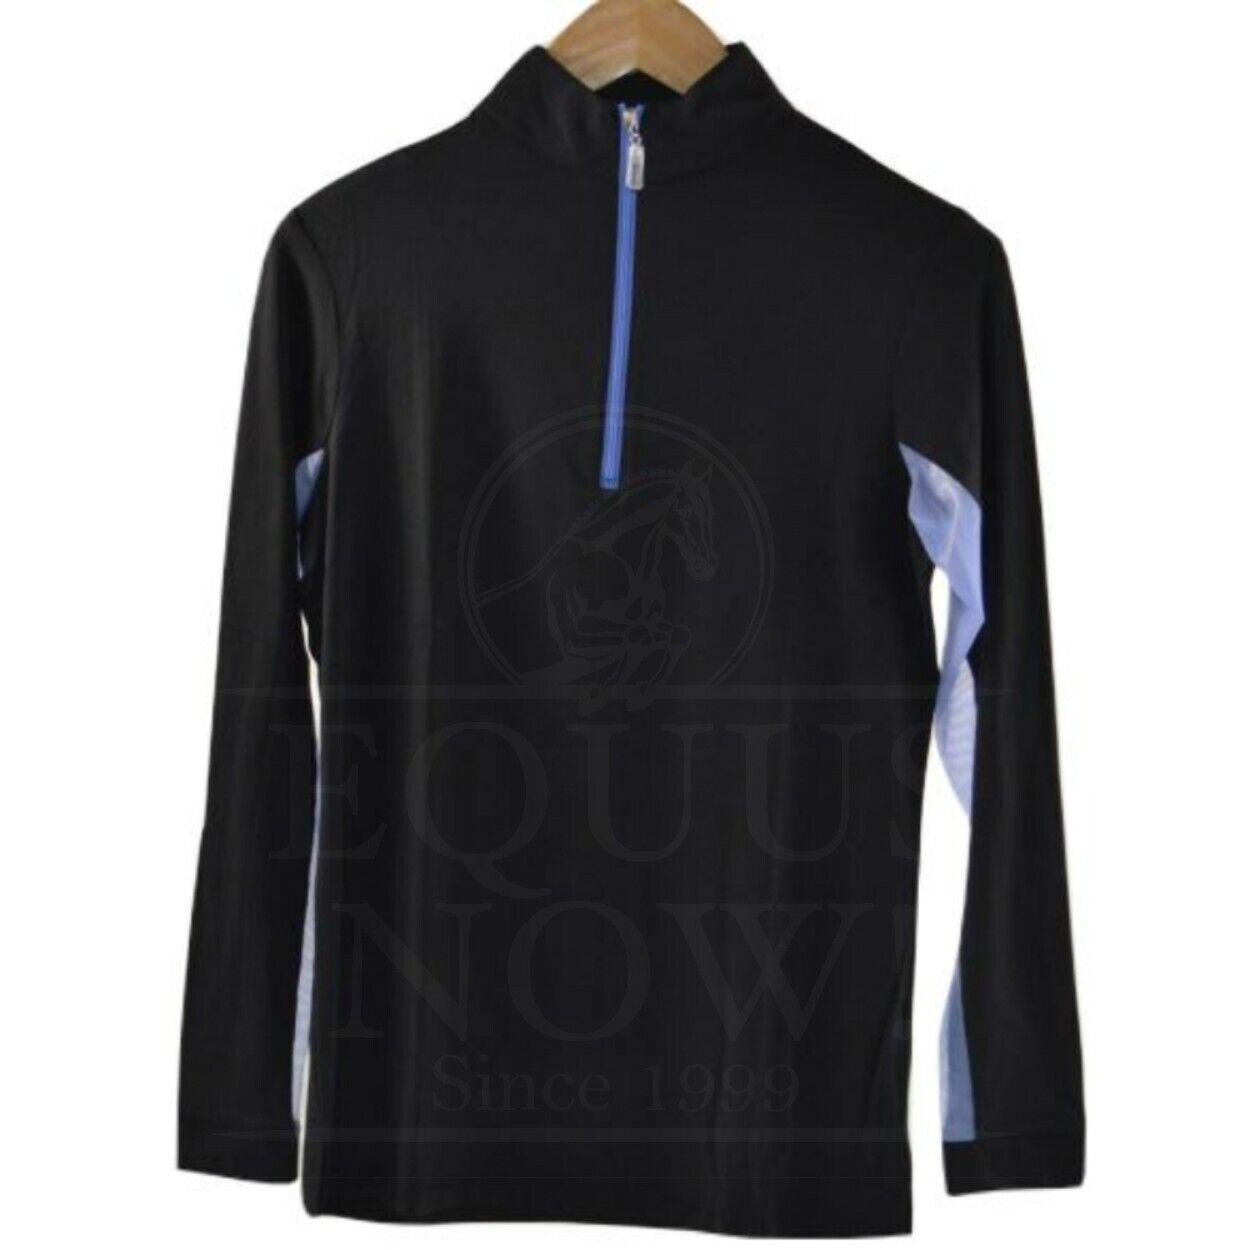 Sportsonetwerk Sportsman Icesfil Zip Top Lange mouw Shirt --zwart Iris --Kies Grootte